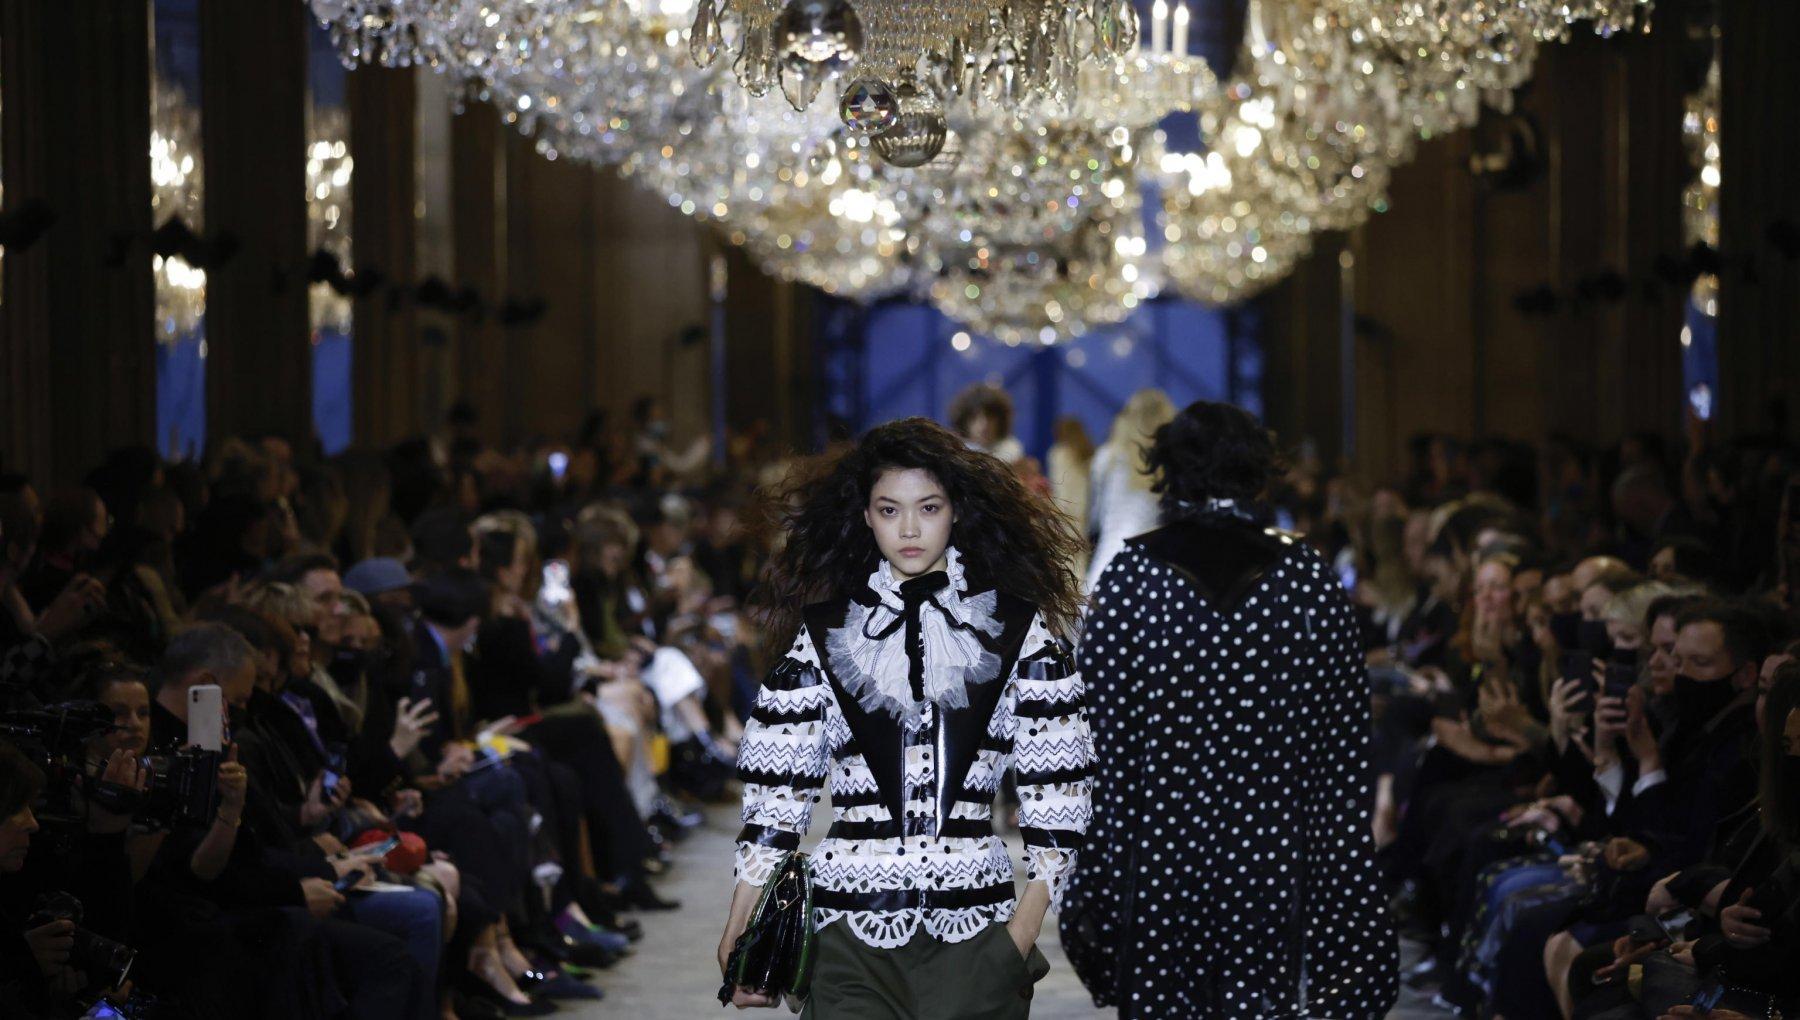 louis vuitton pe 22 - Gli show della Paris Fashion Week P/E 22